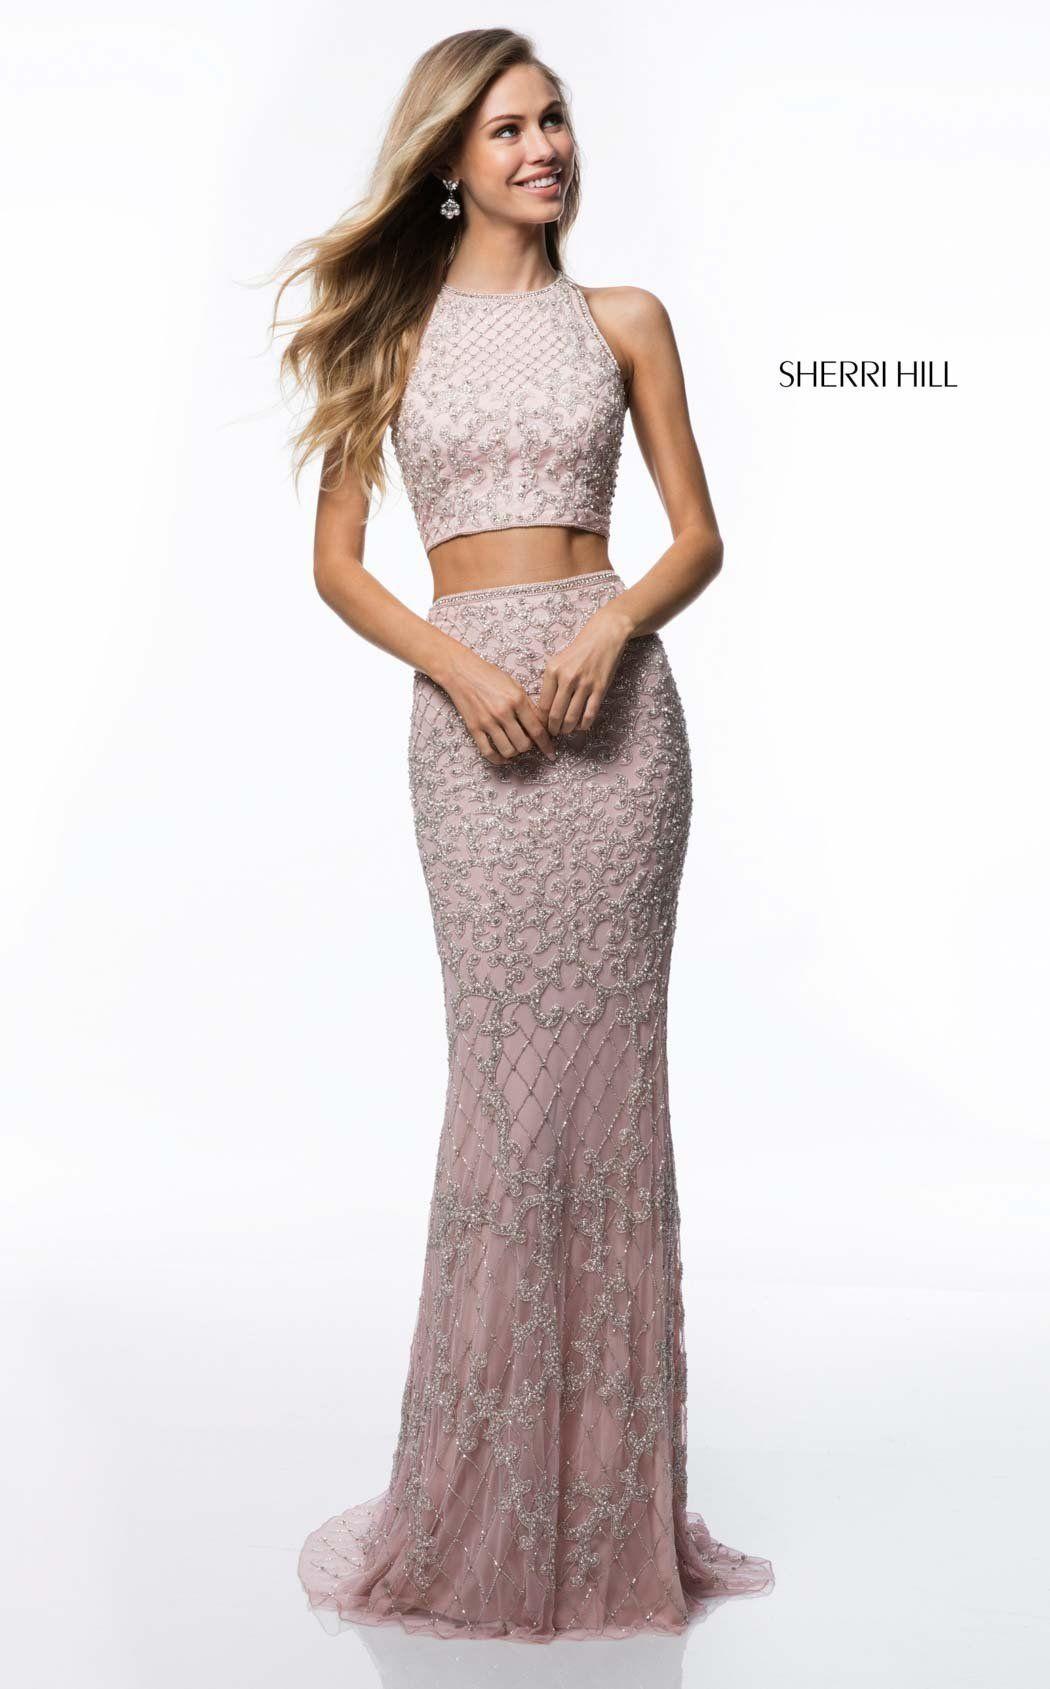 Sherri hill vestuário pinterest prom dresses dresses